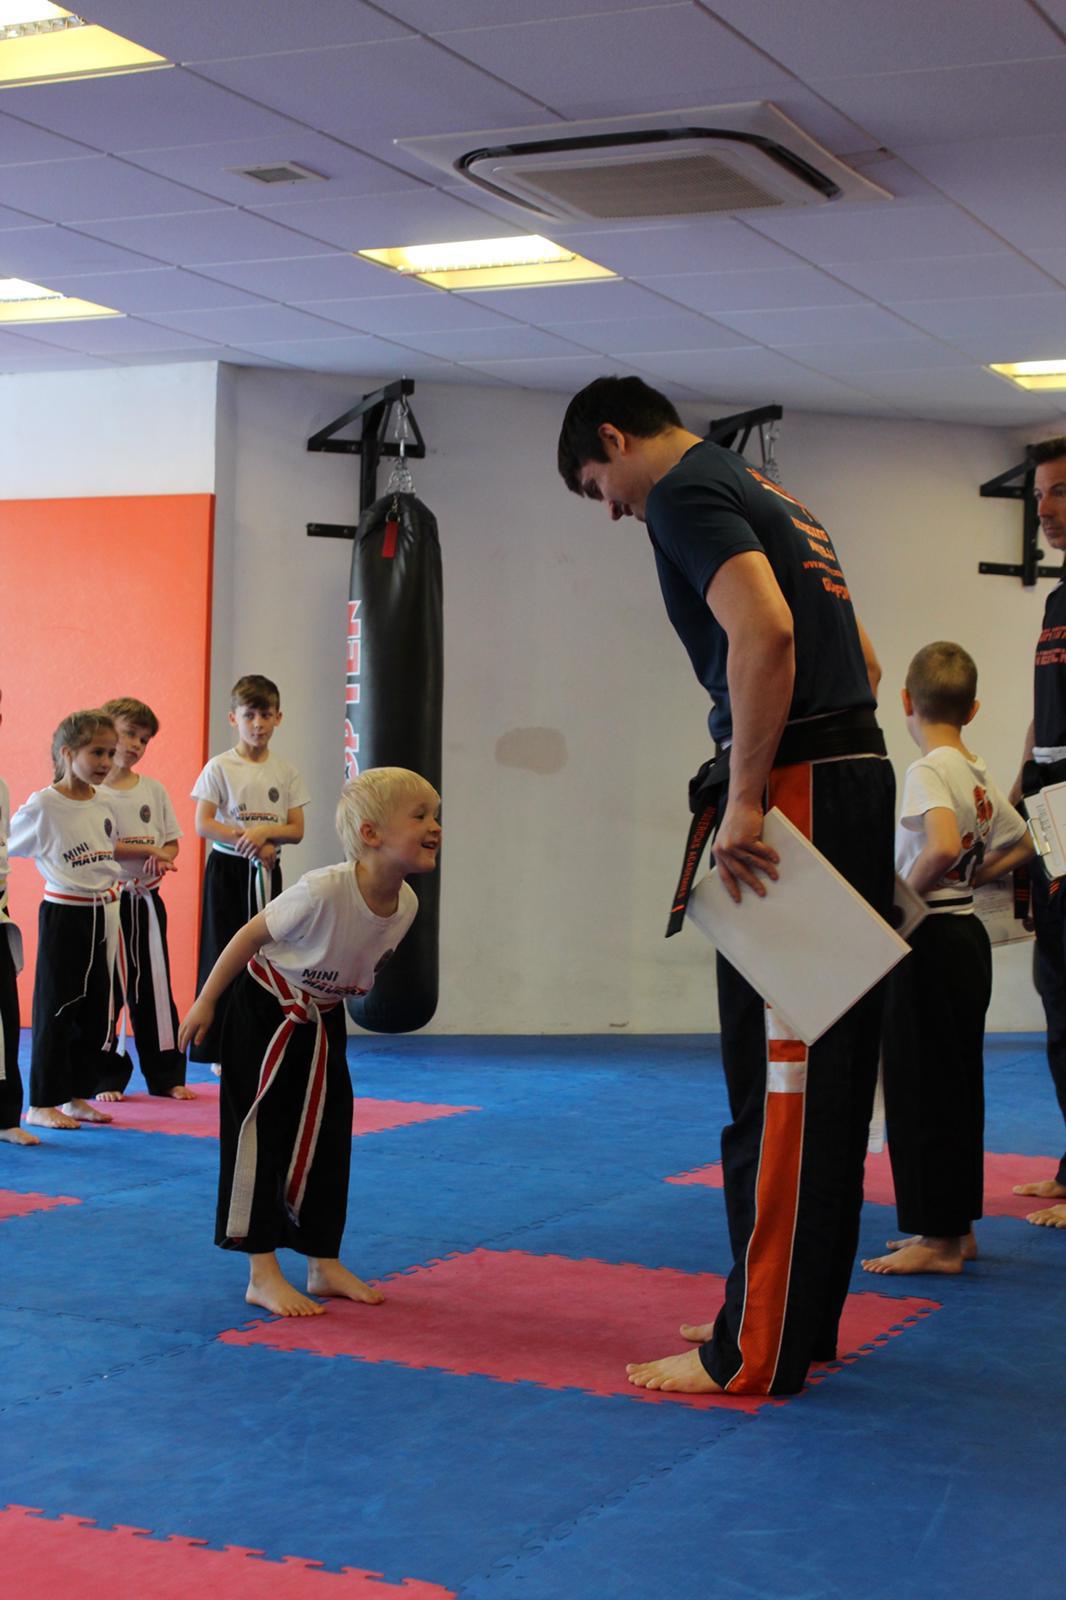 Kids Kickboxing at Mavericks Martial Arts in Guildford, Surrey.